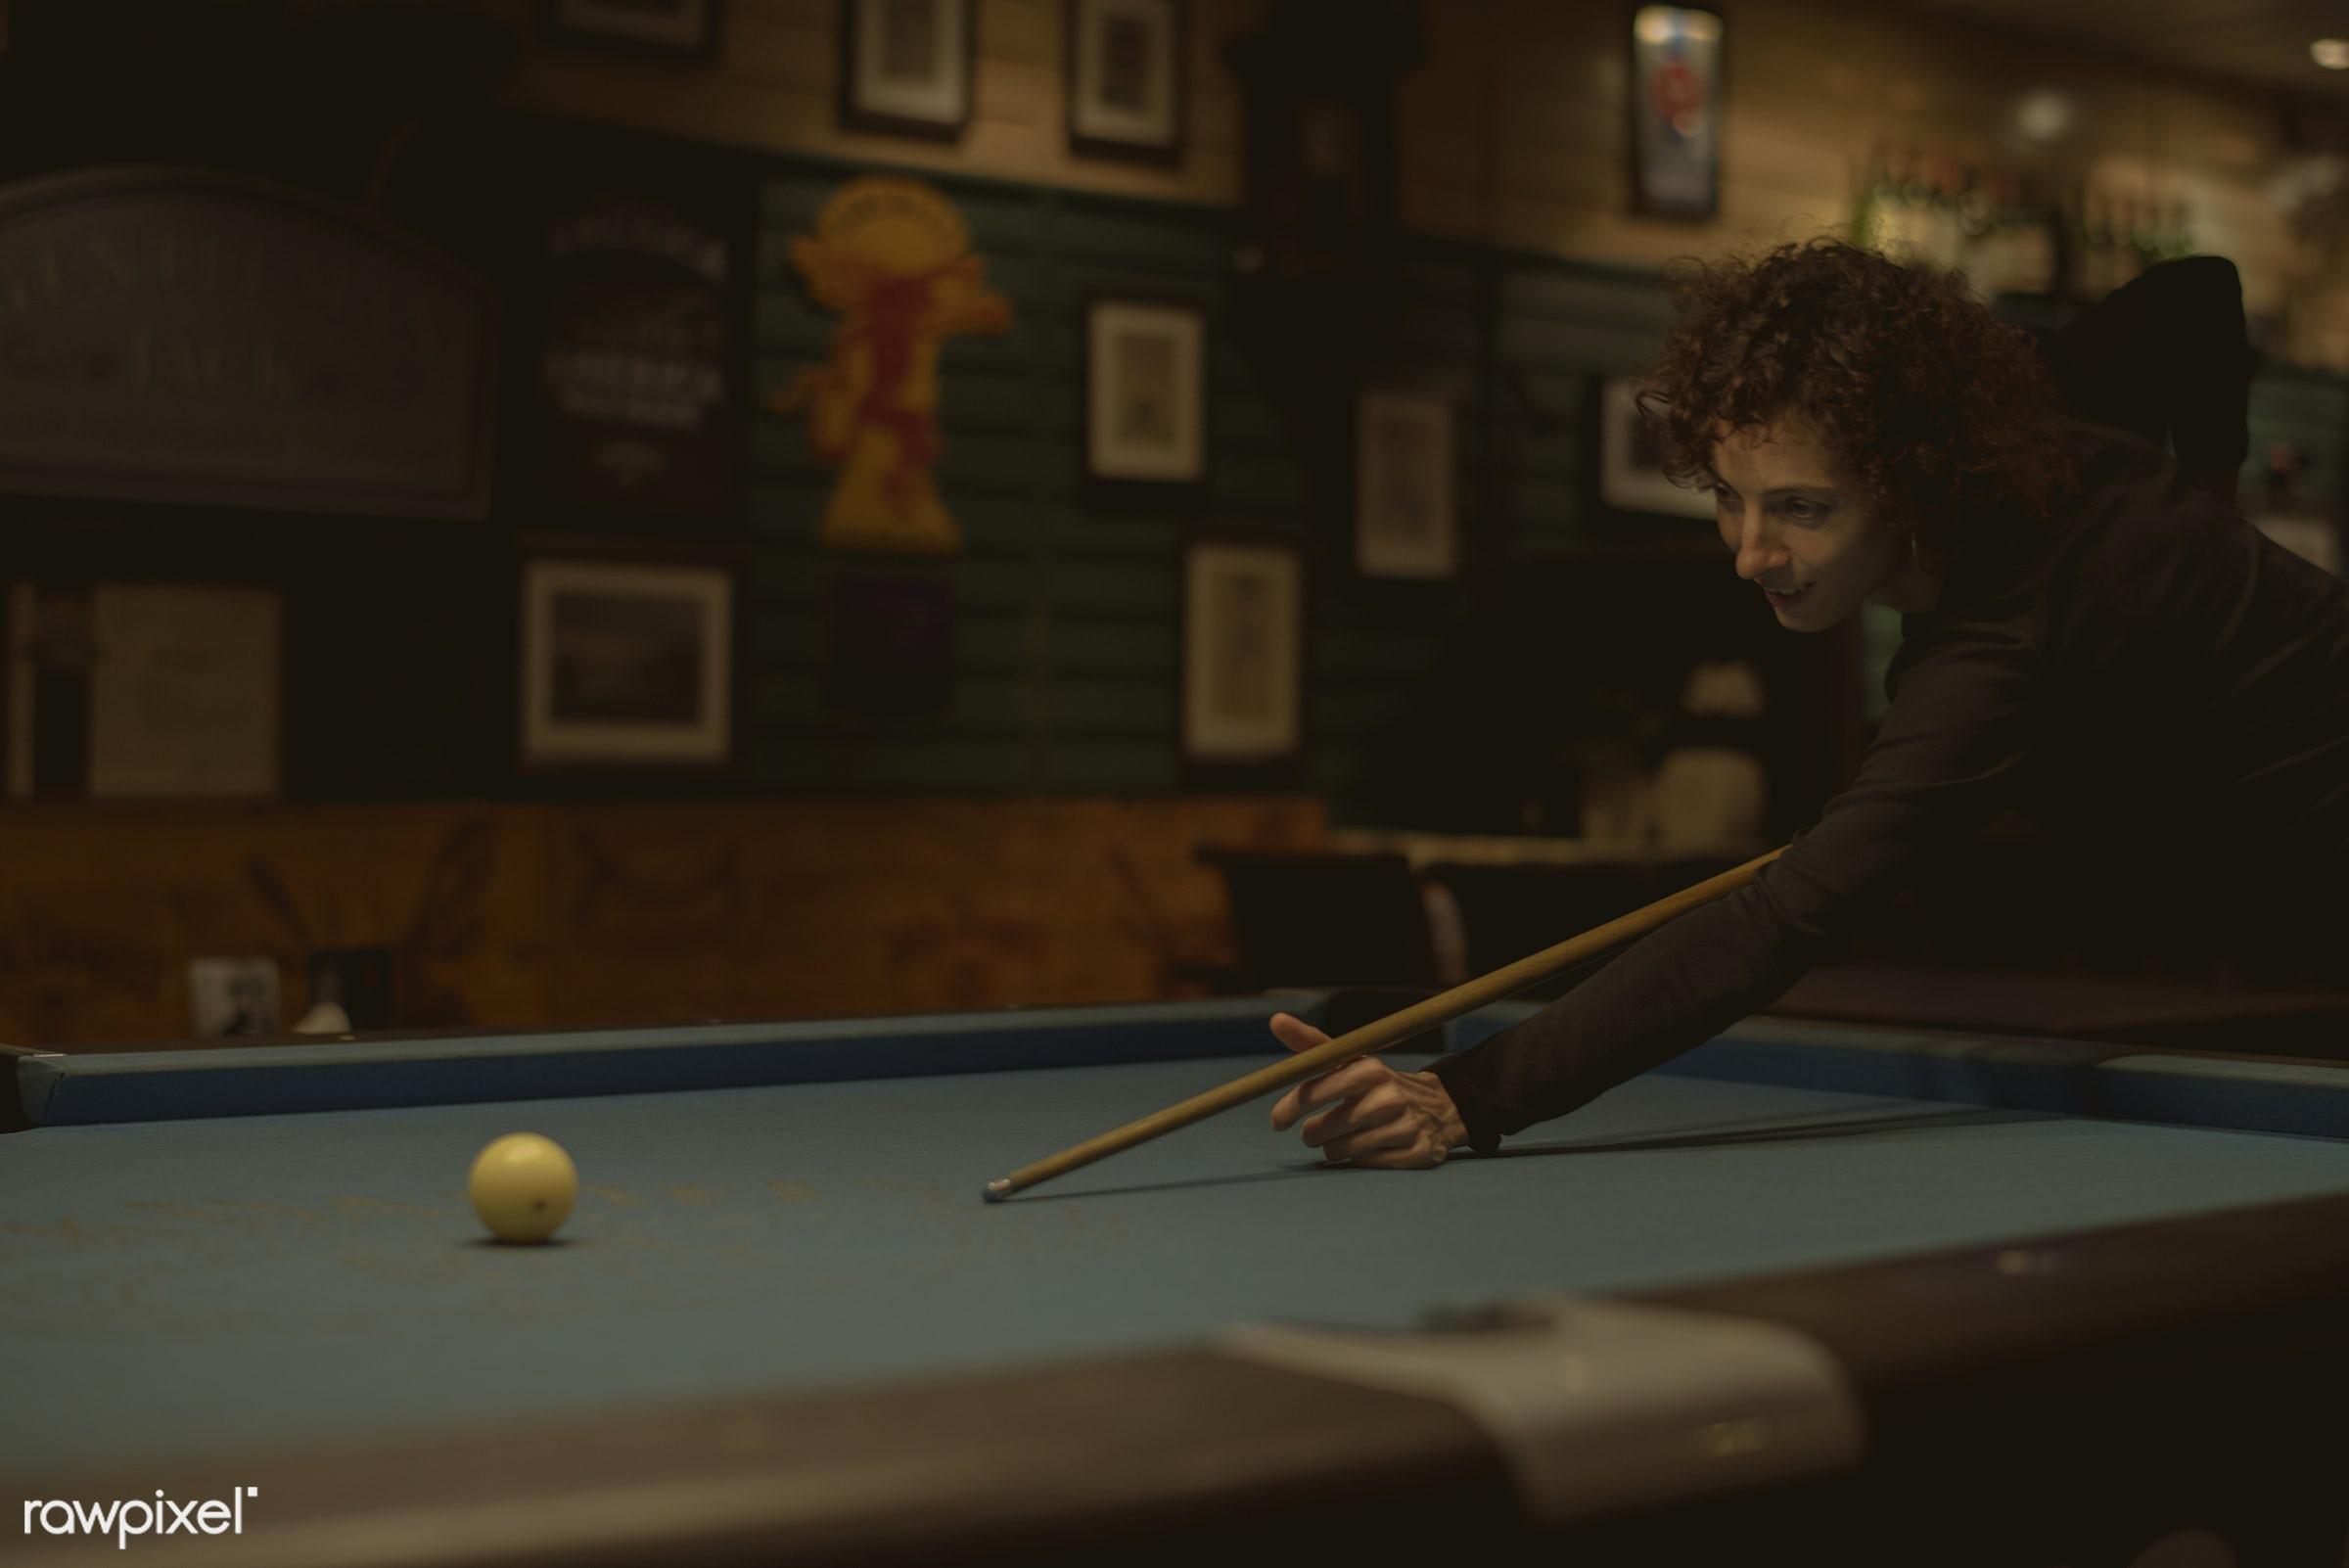 Woman playing pool at a bar - 8 ball, aiming, alone, balls, bar, billiard, caucasian, cue, curly hair, dark, enjoy,...